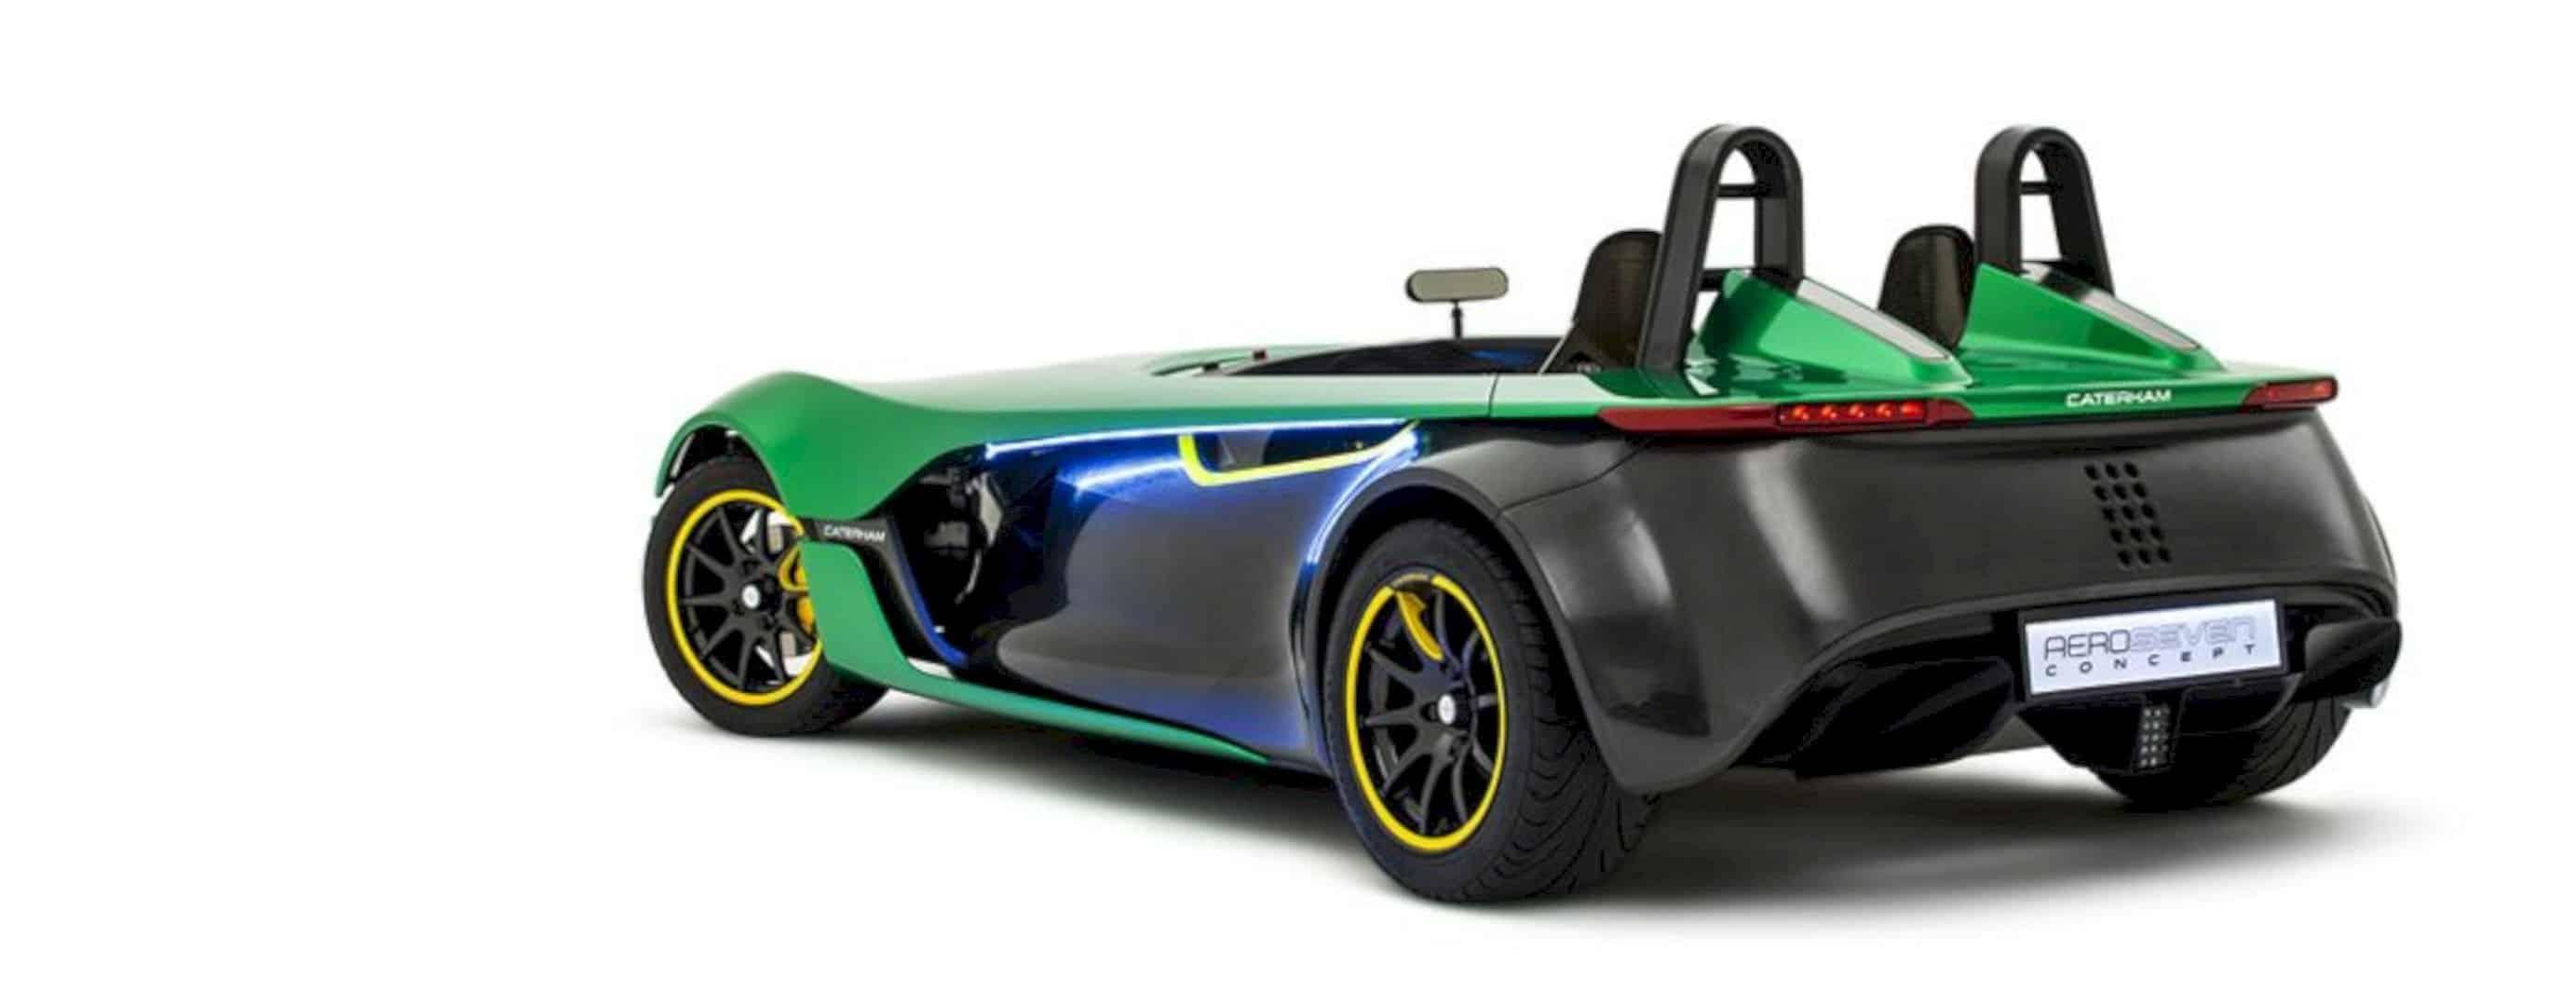 The Aero Seven Concept 6